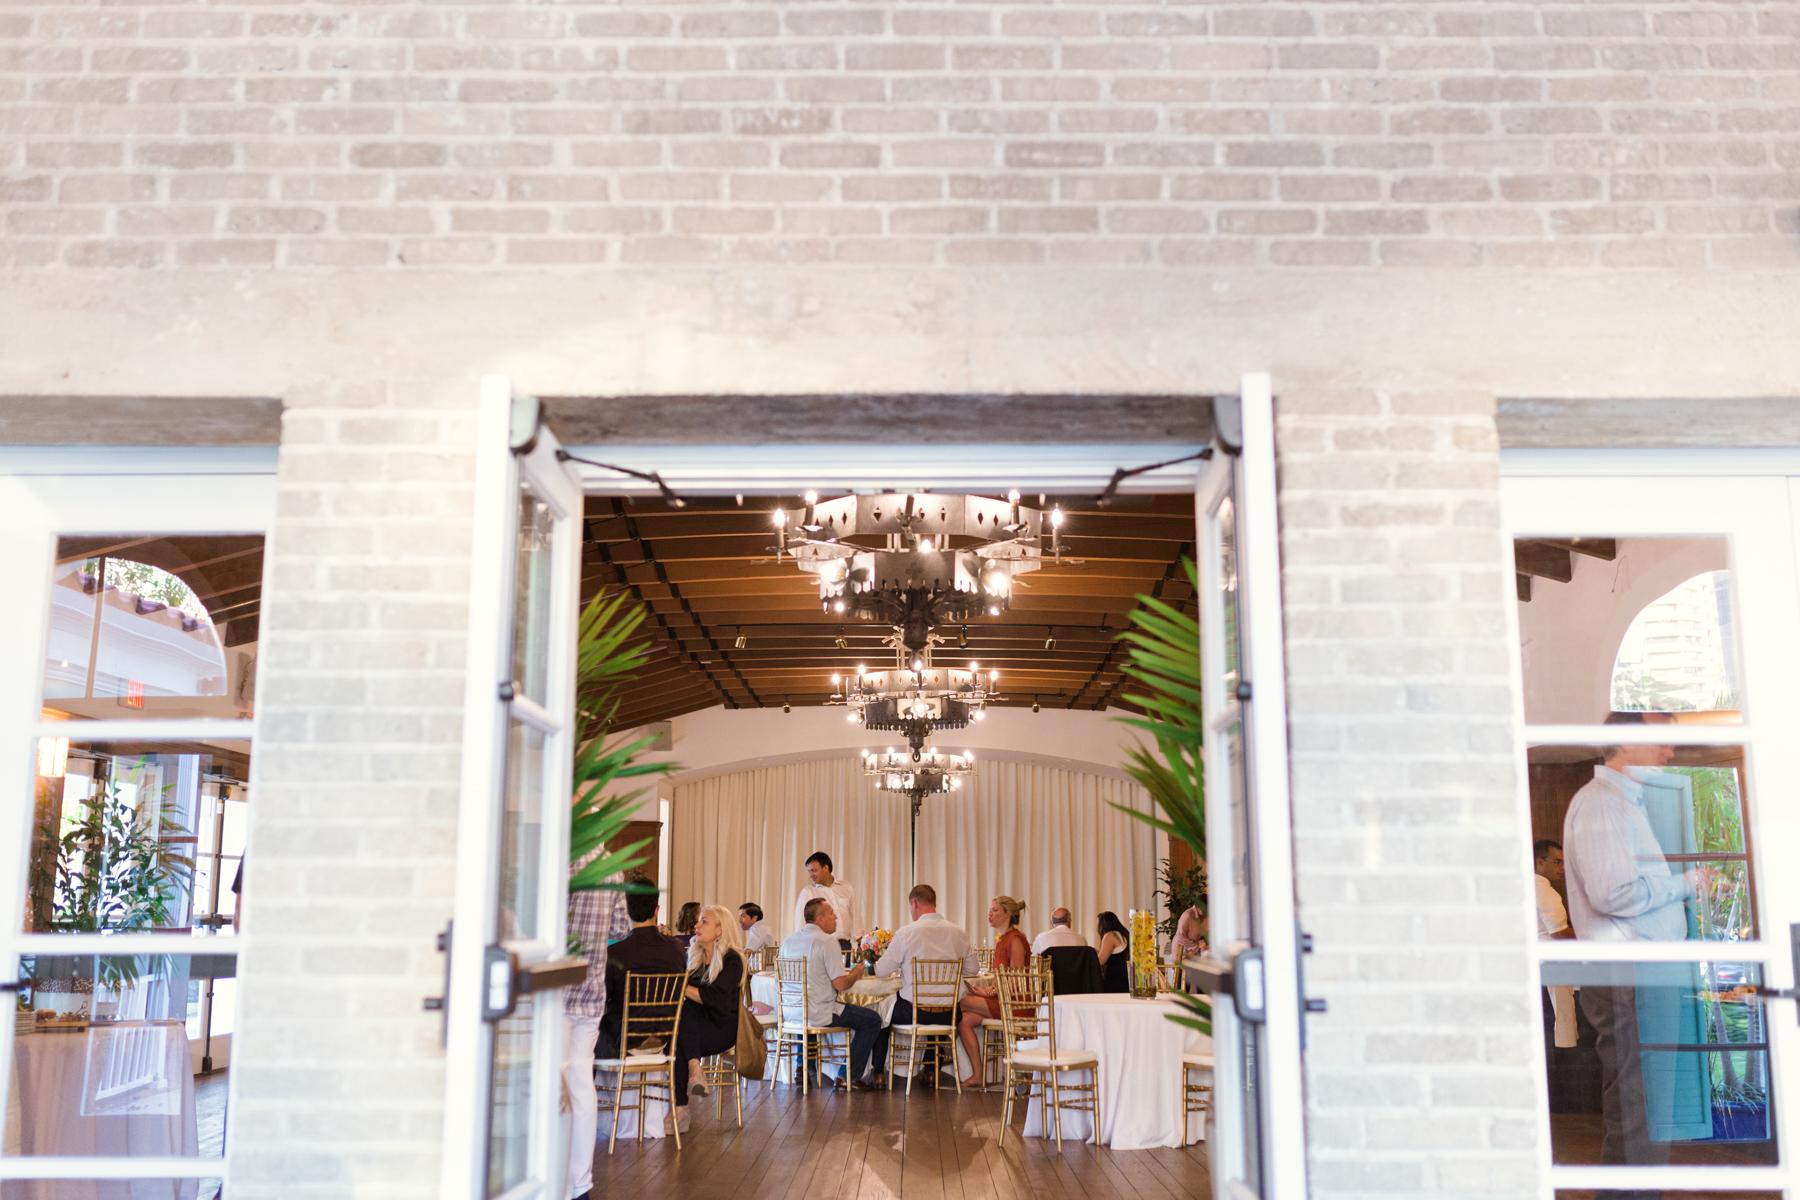 South-Florida-Event-Photographer-Rehearsal-Dinner-Photography-Miami-Beach-Womens-Club